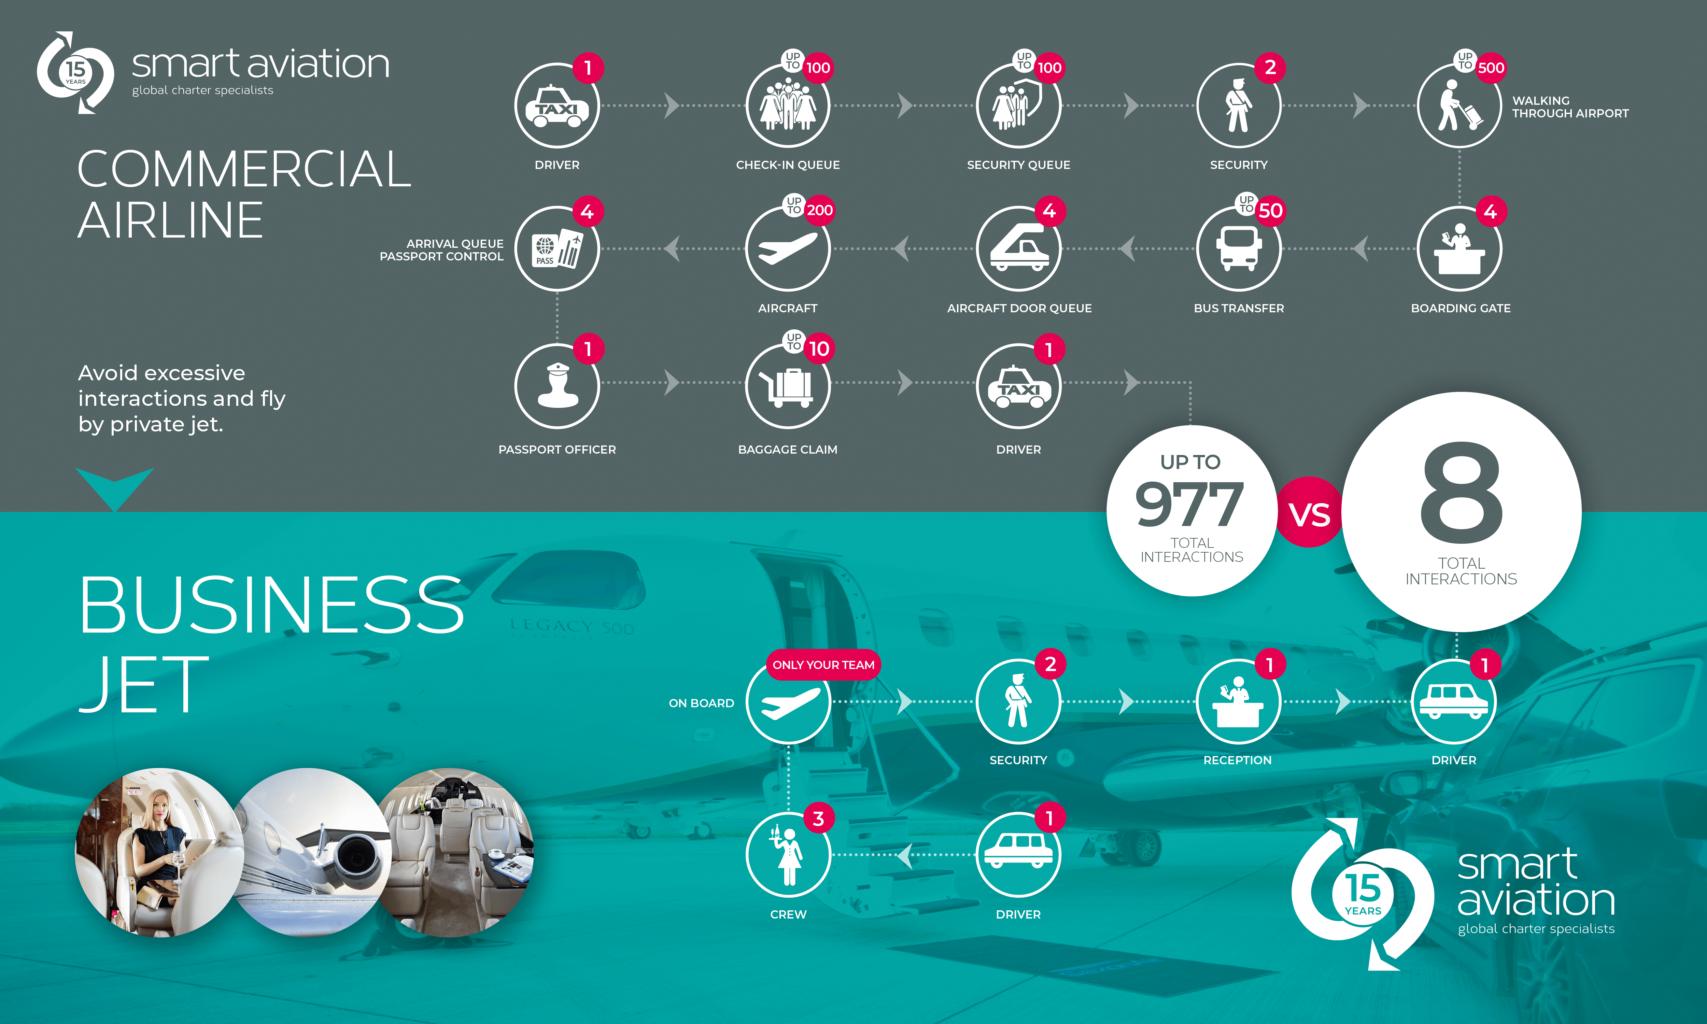 Travel safe infographic